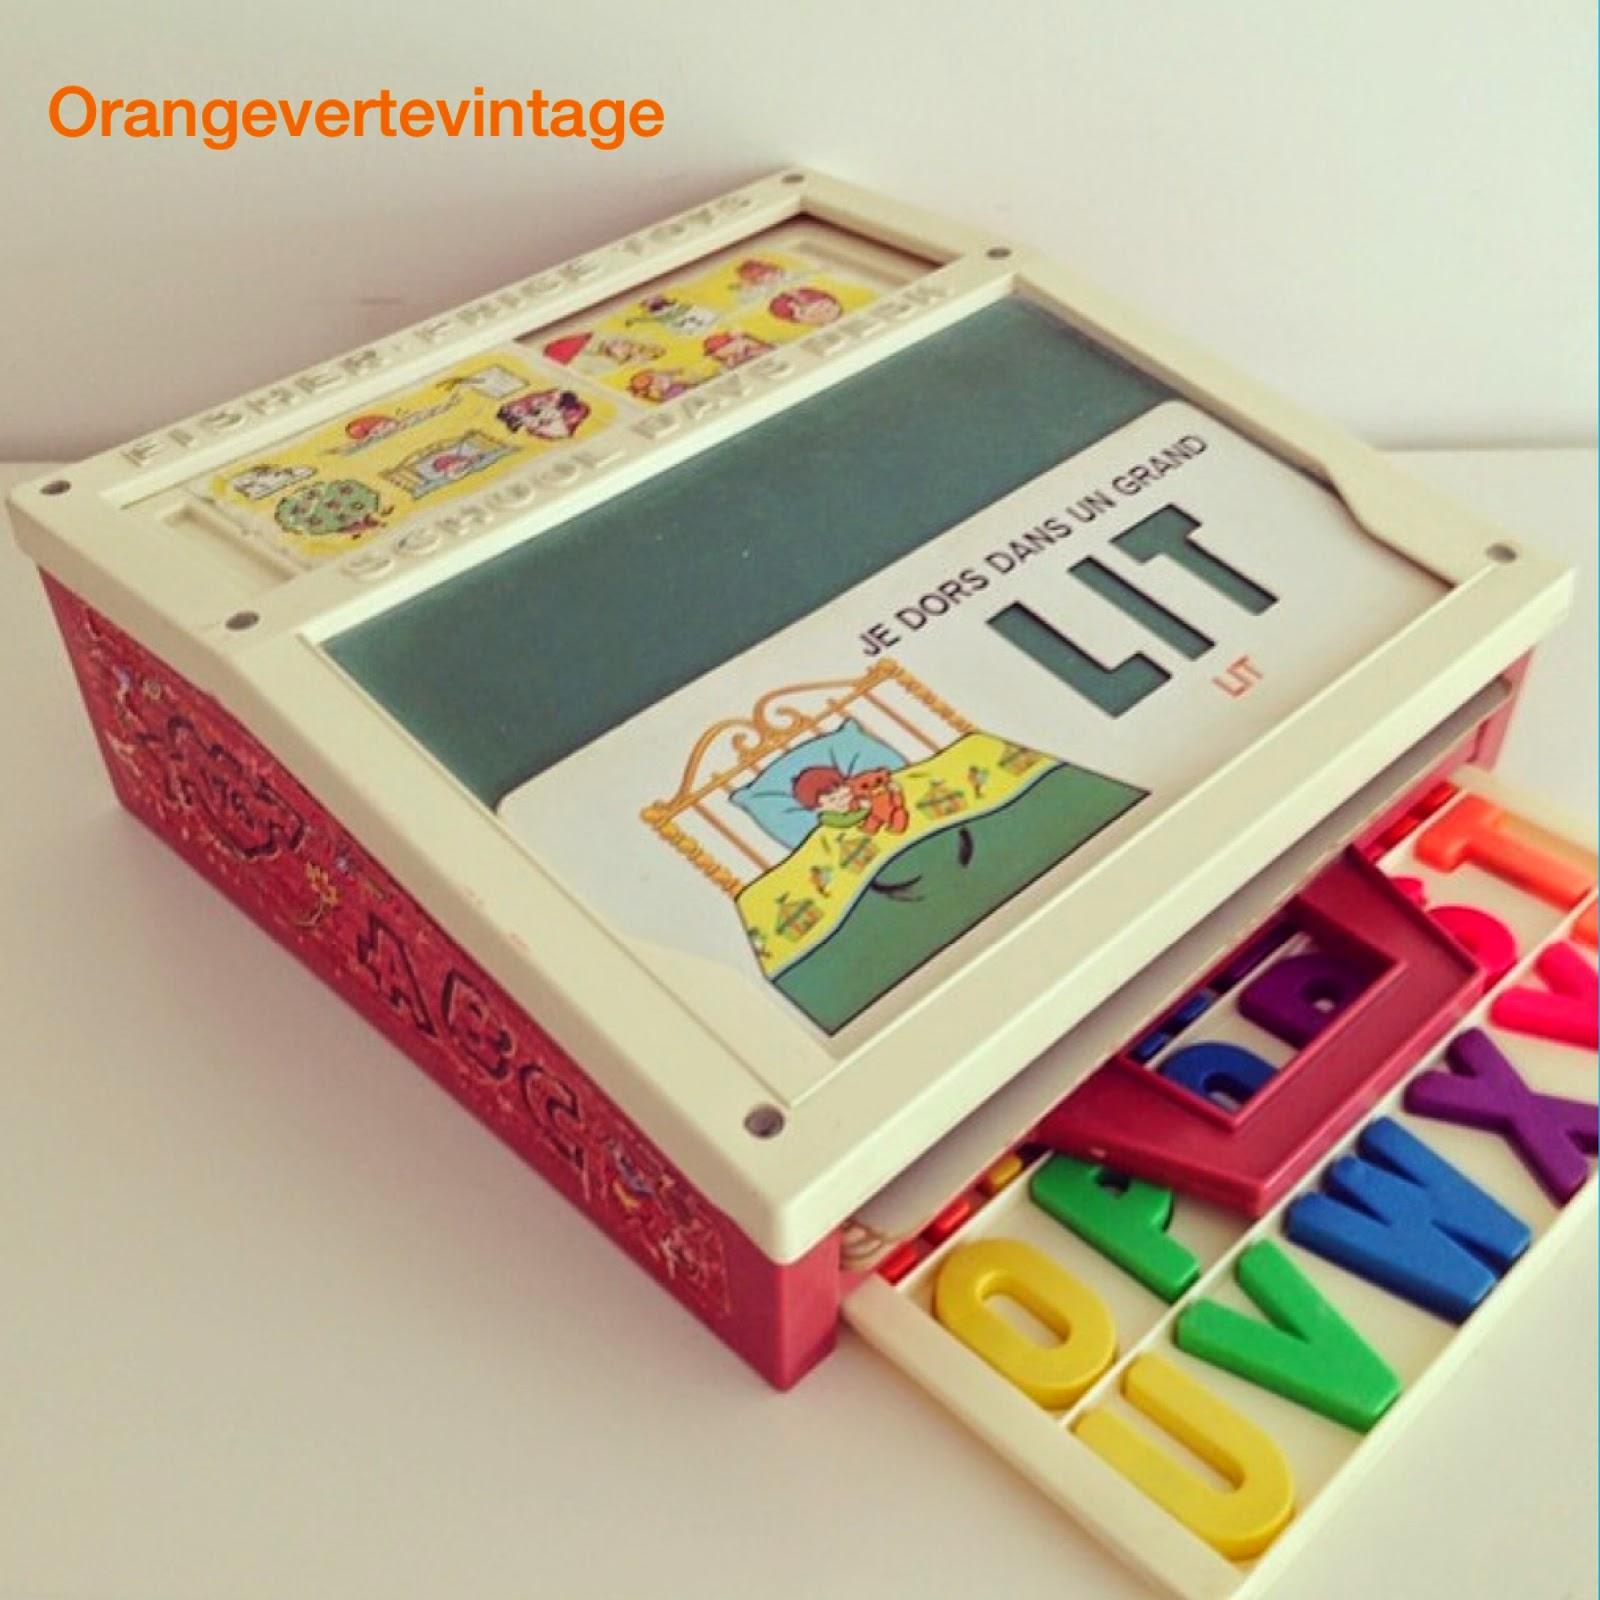 orange verte vintage